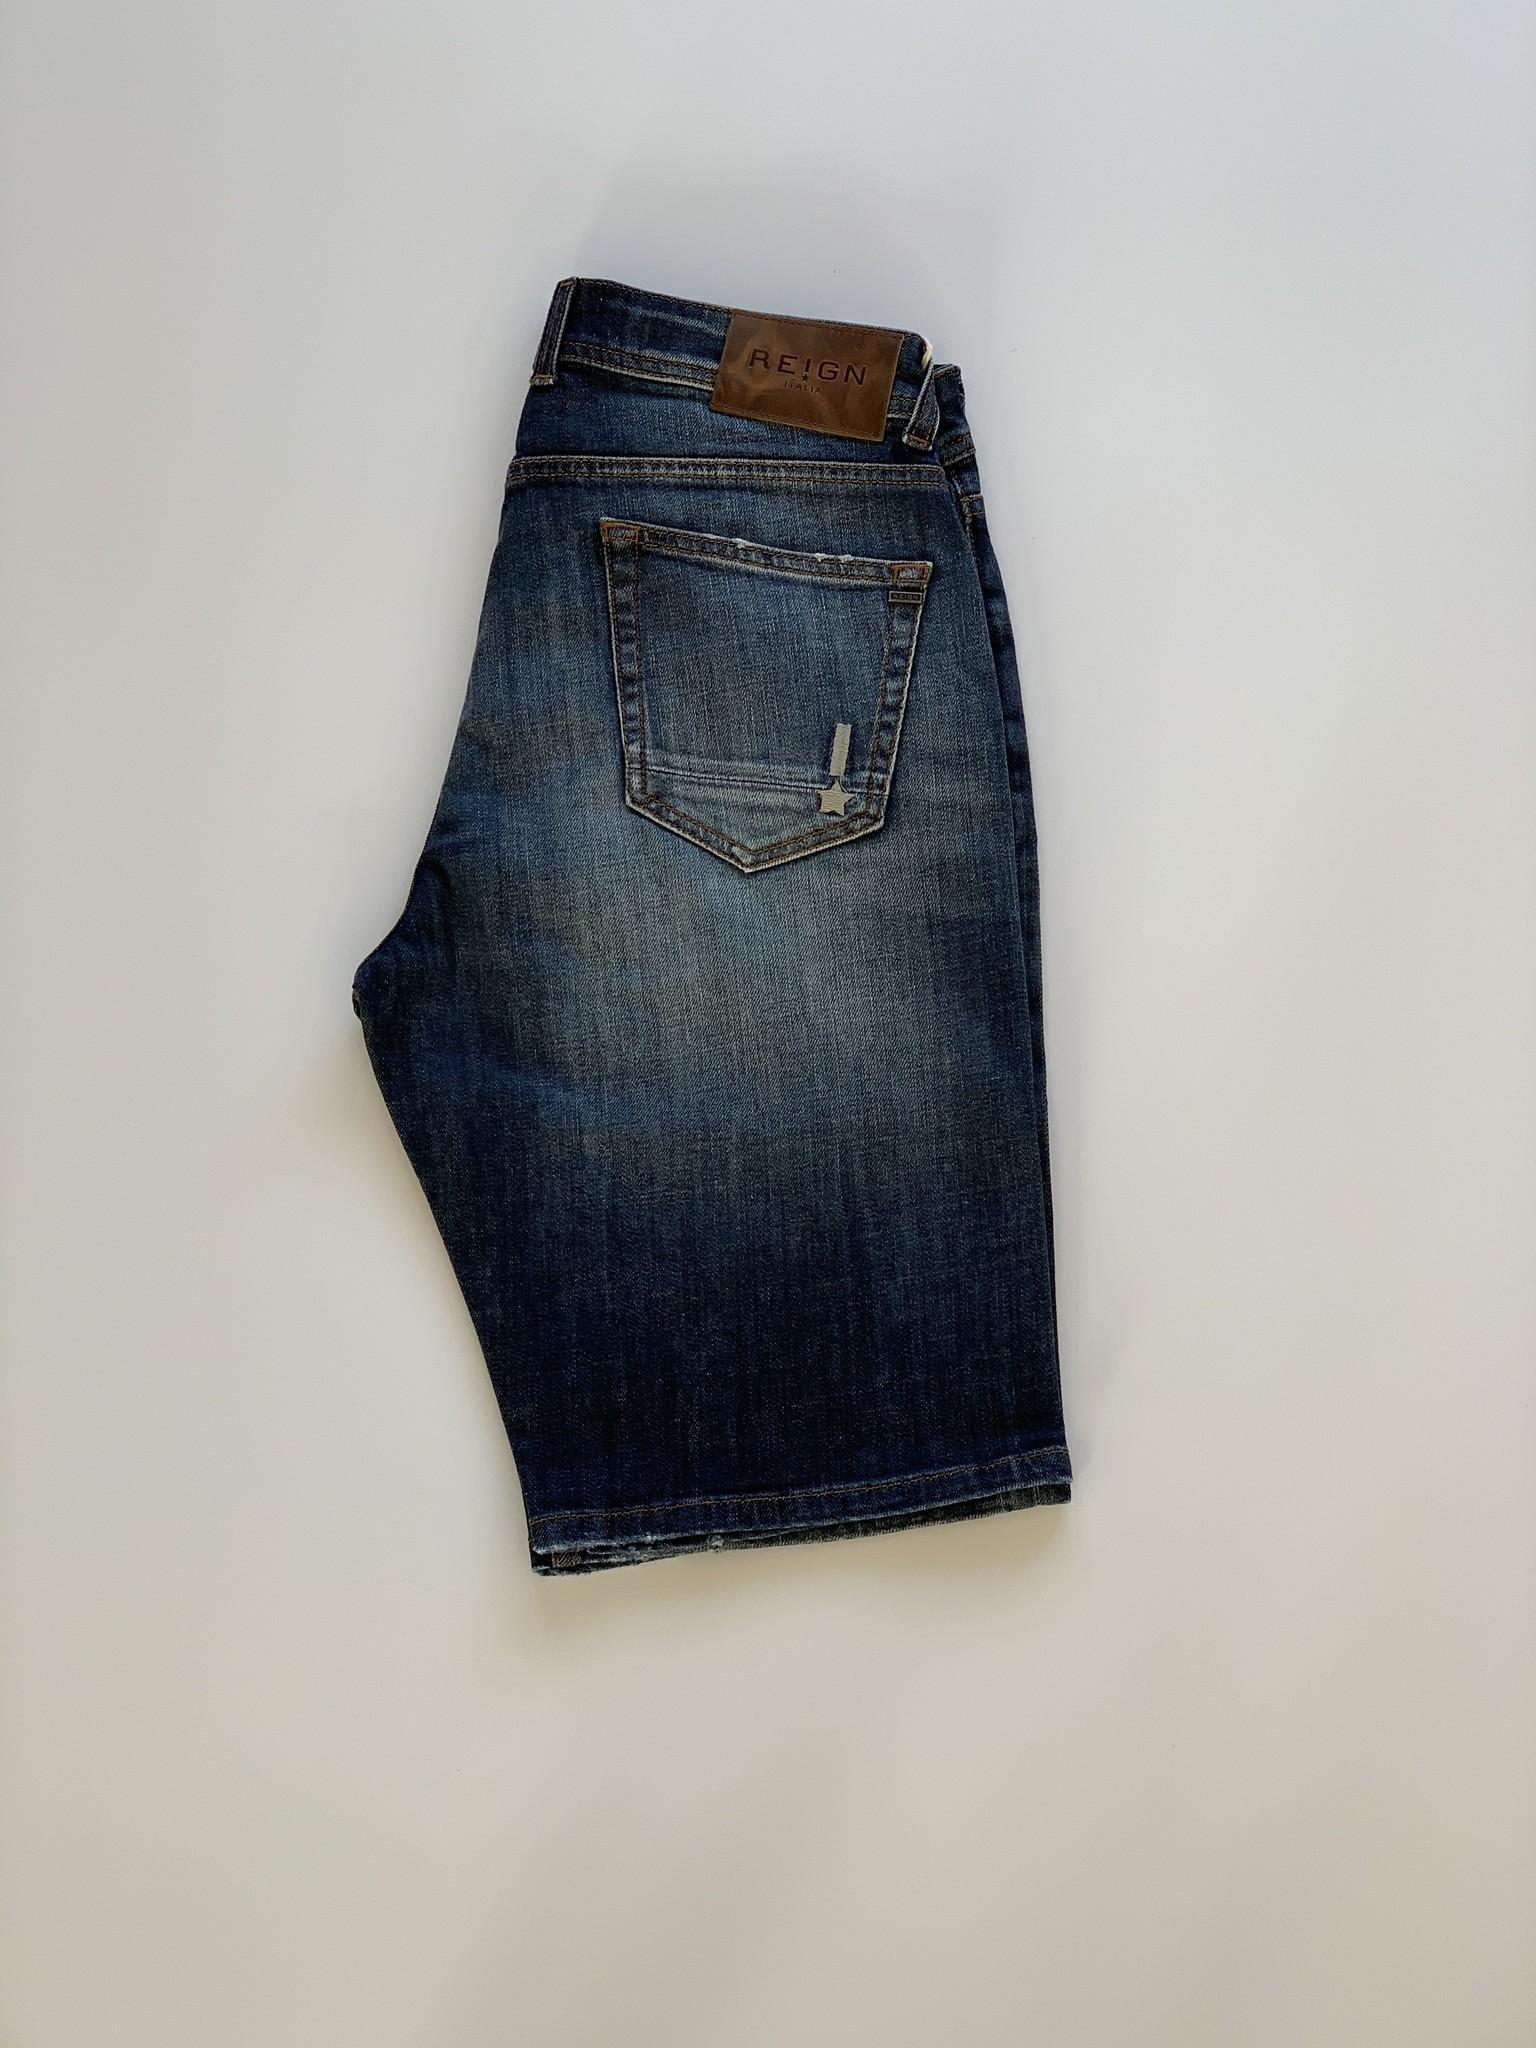 Ethan Malaga Jeans Short-2